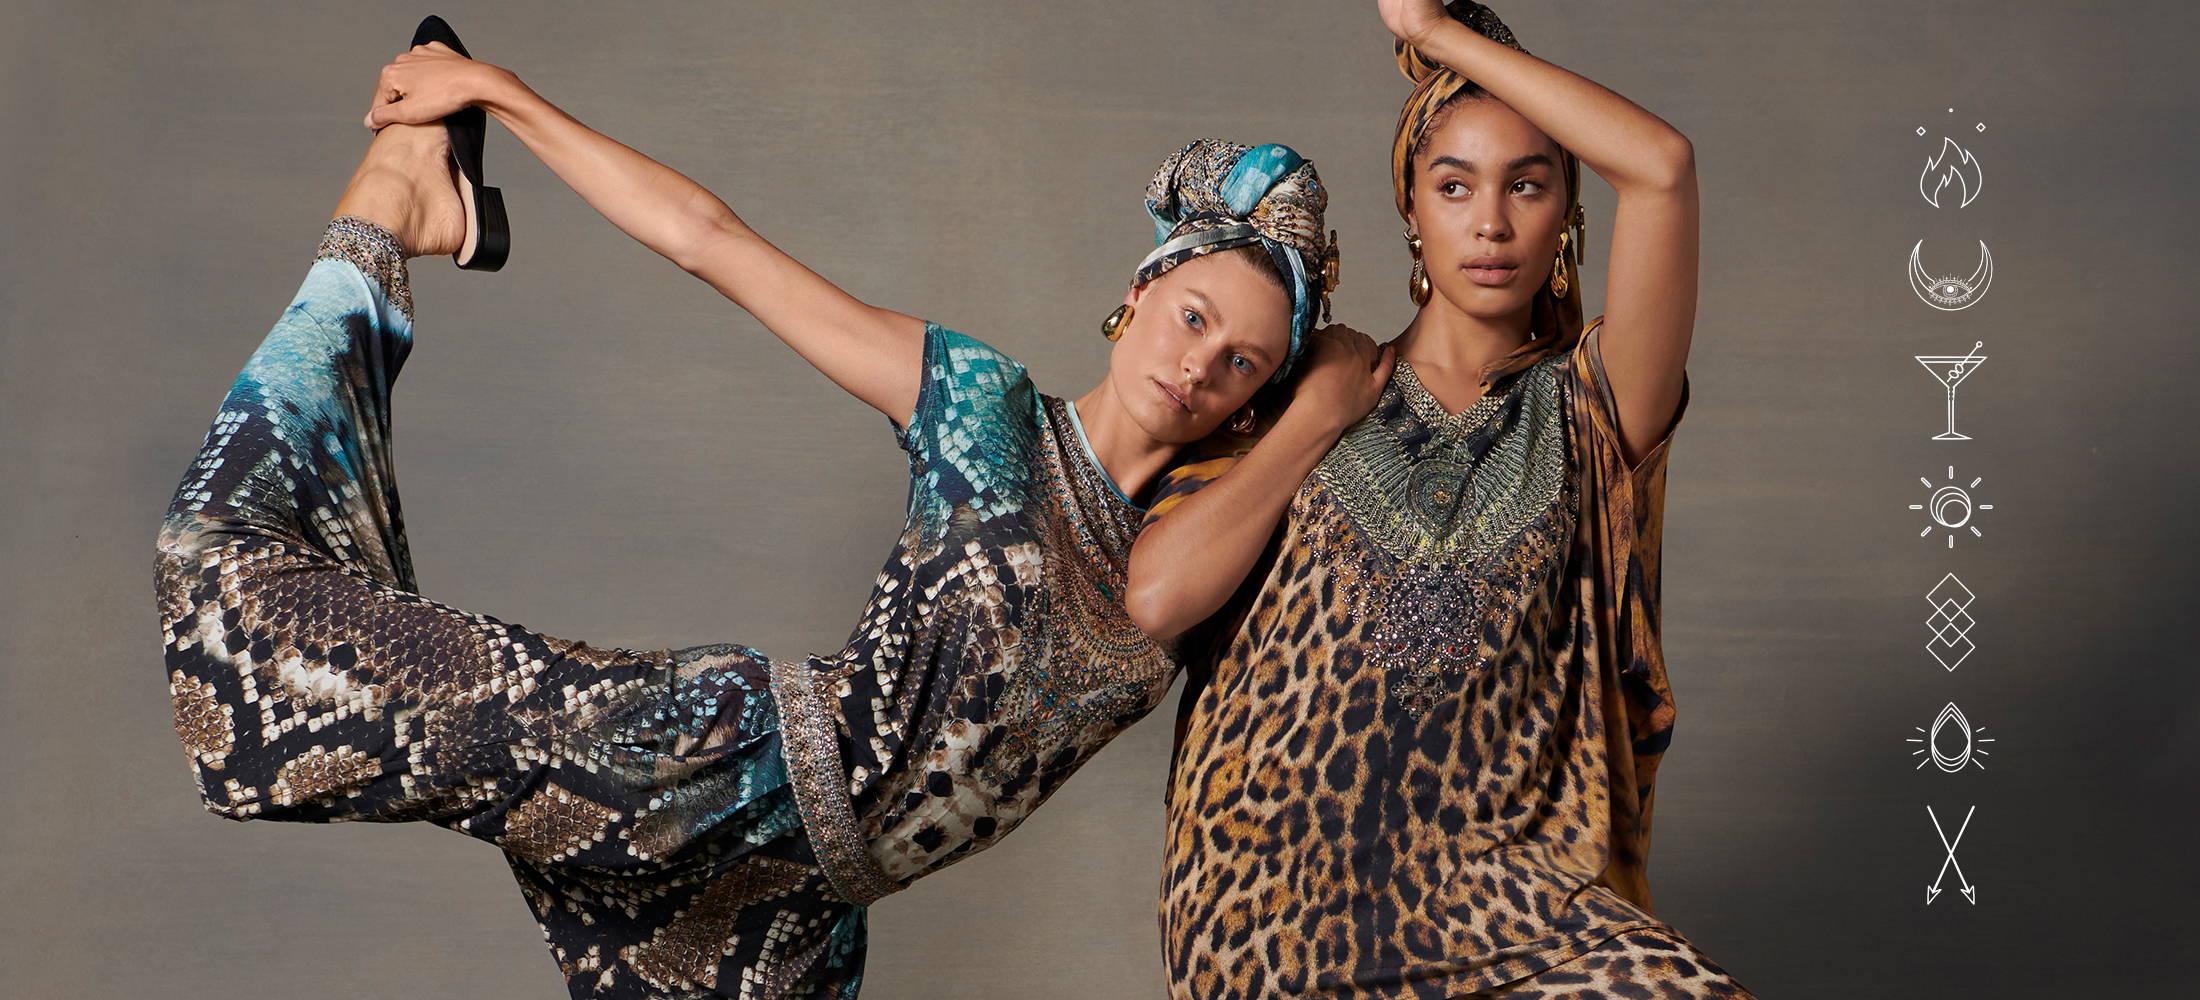 CAMILLA loungewear, CAMILLA leggings, CAMILLA hoodie, CAMILLA leopard print loungewear